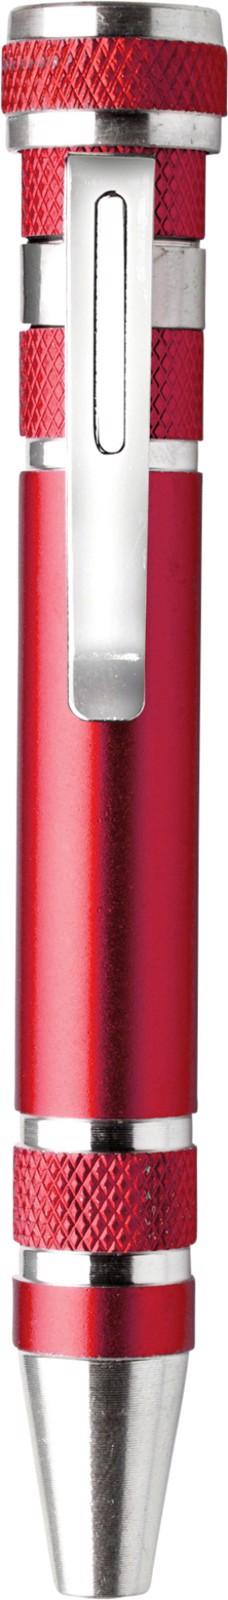 Aluminium pocket screwdriver - Red